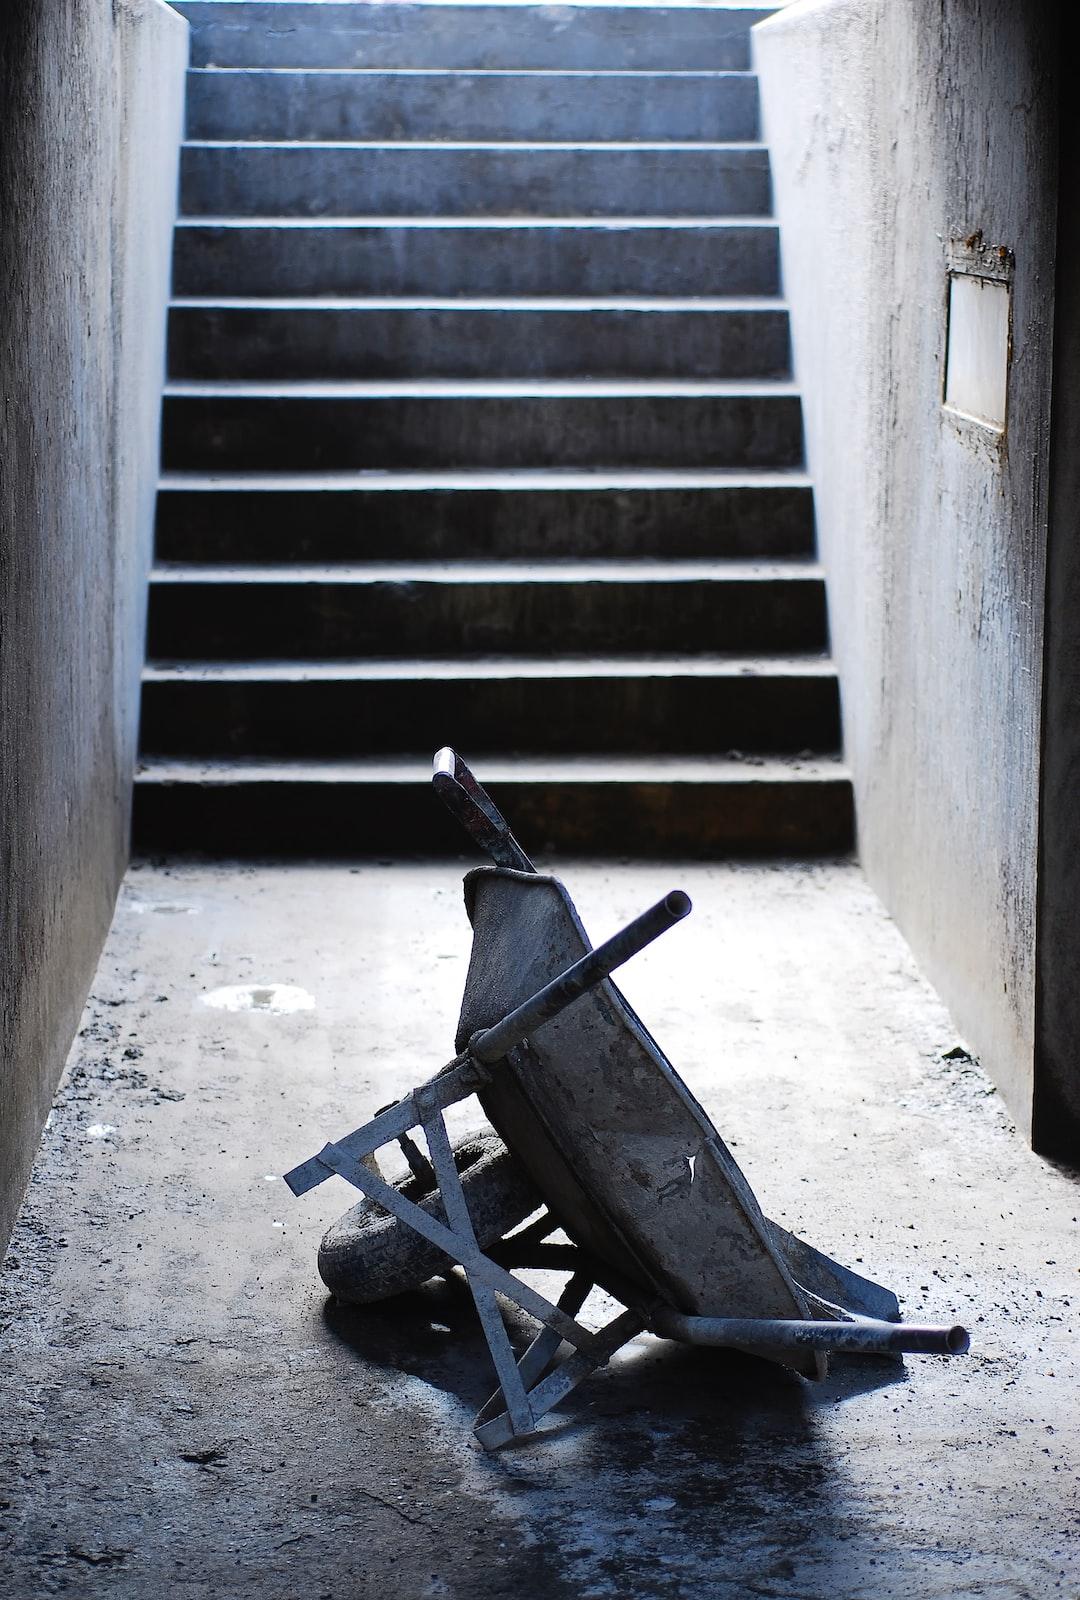 Wheelbarrow at a concrete plant.  Very Worn